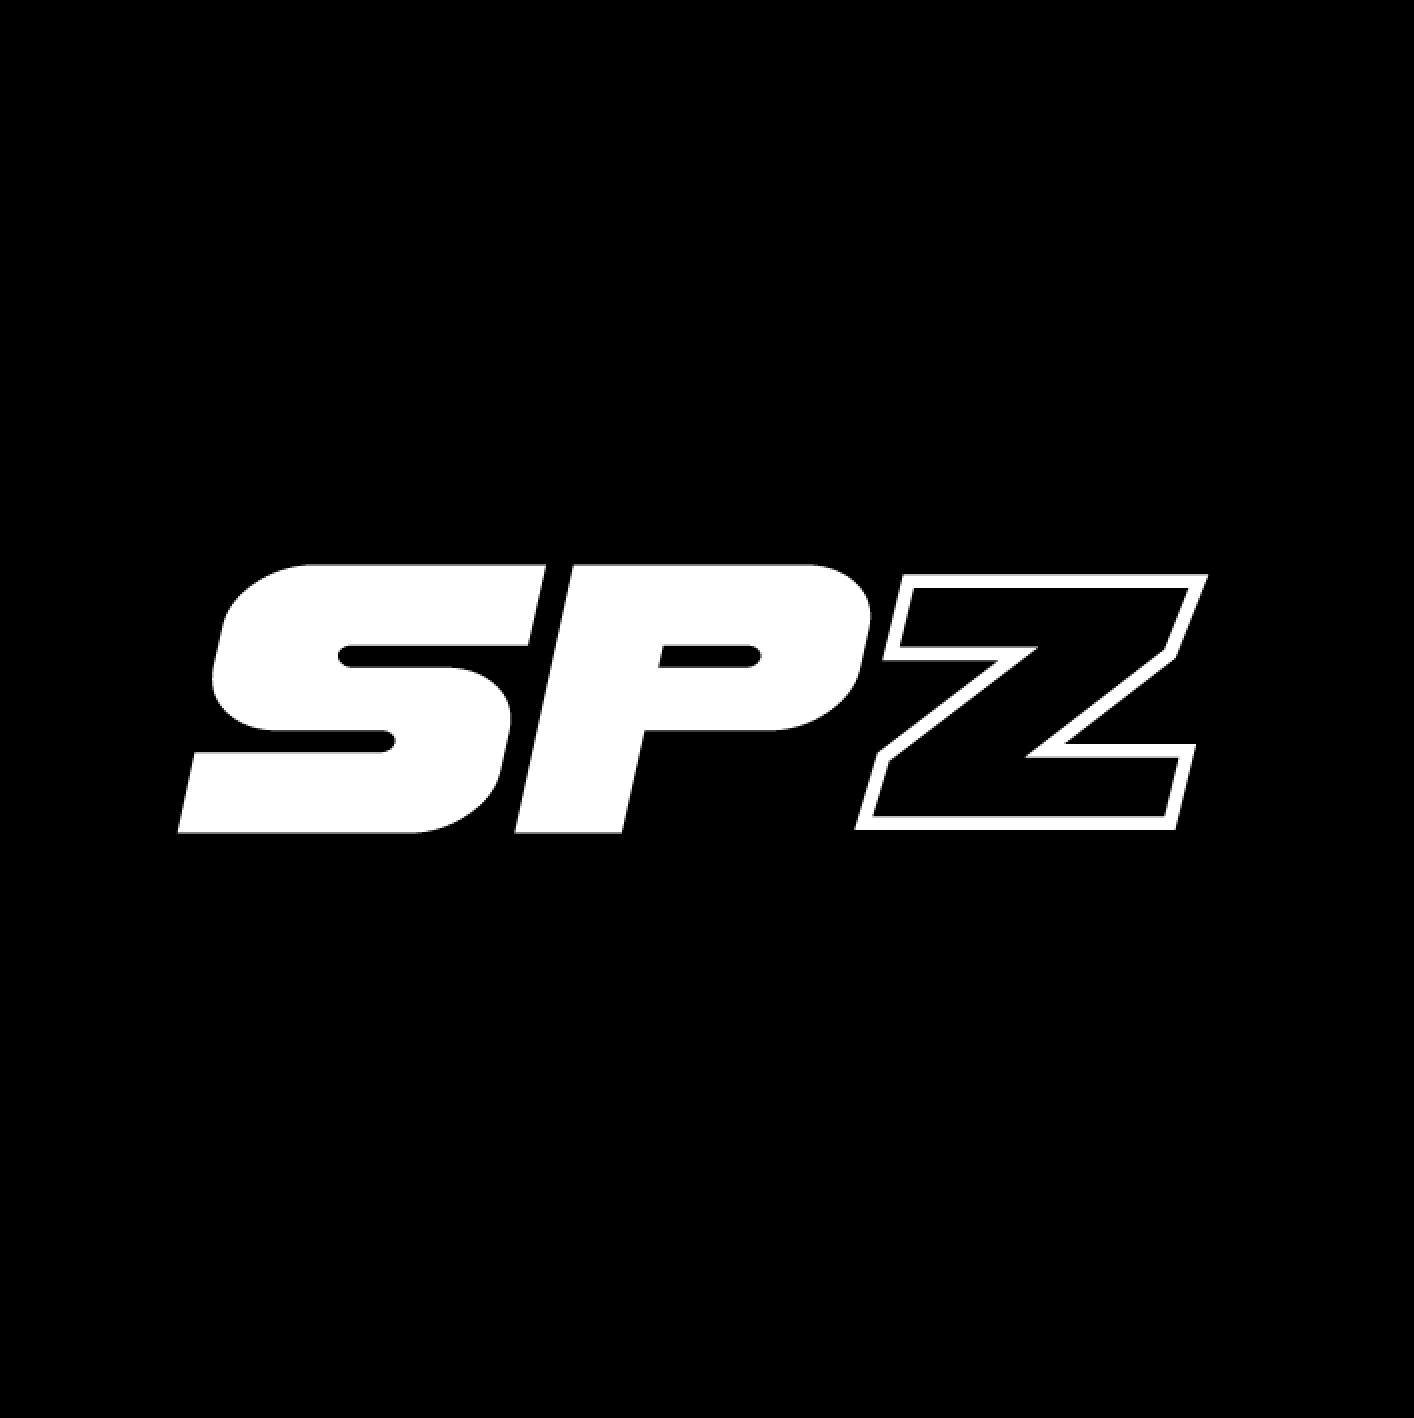 SportsZone